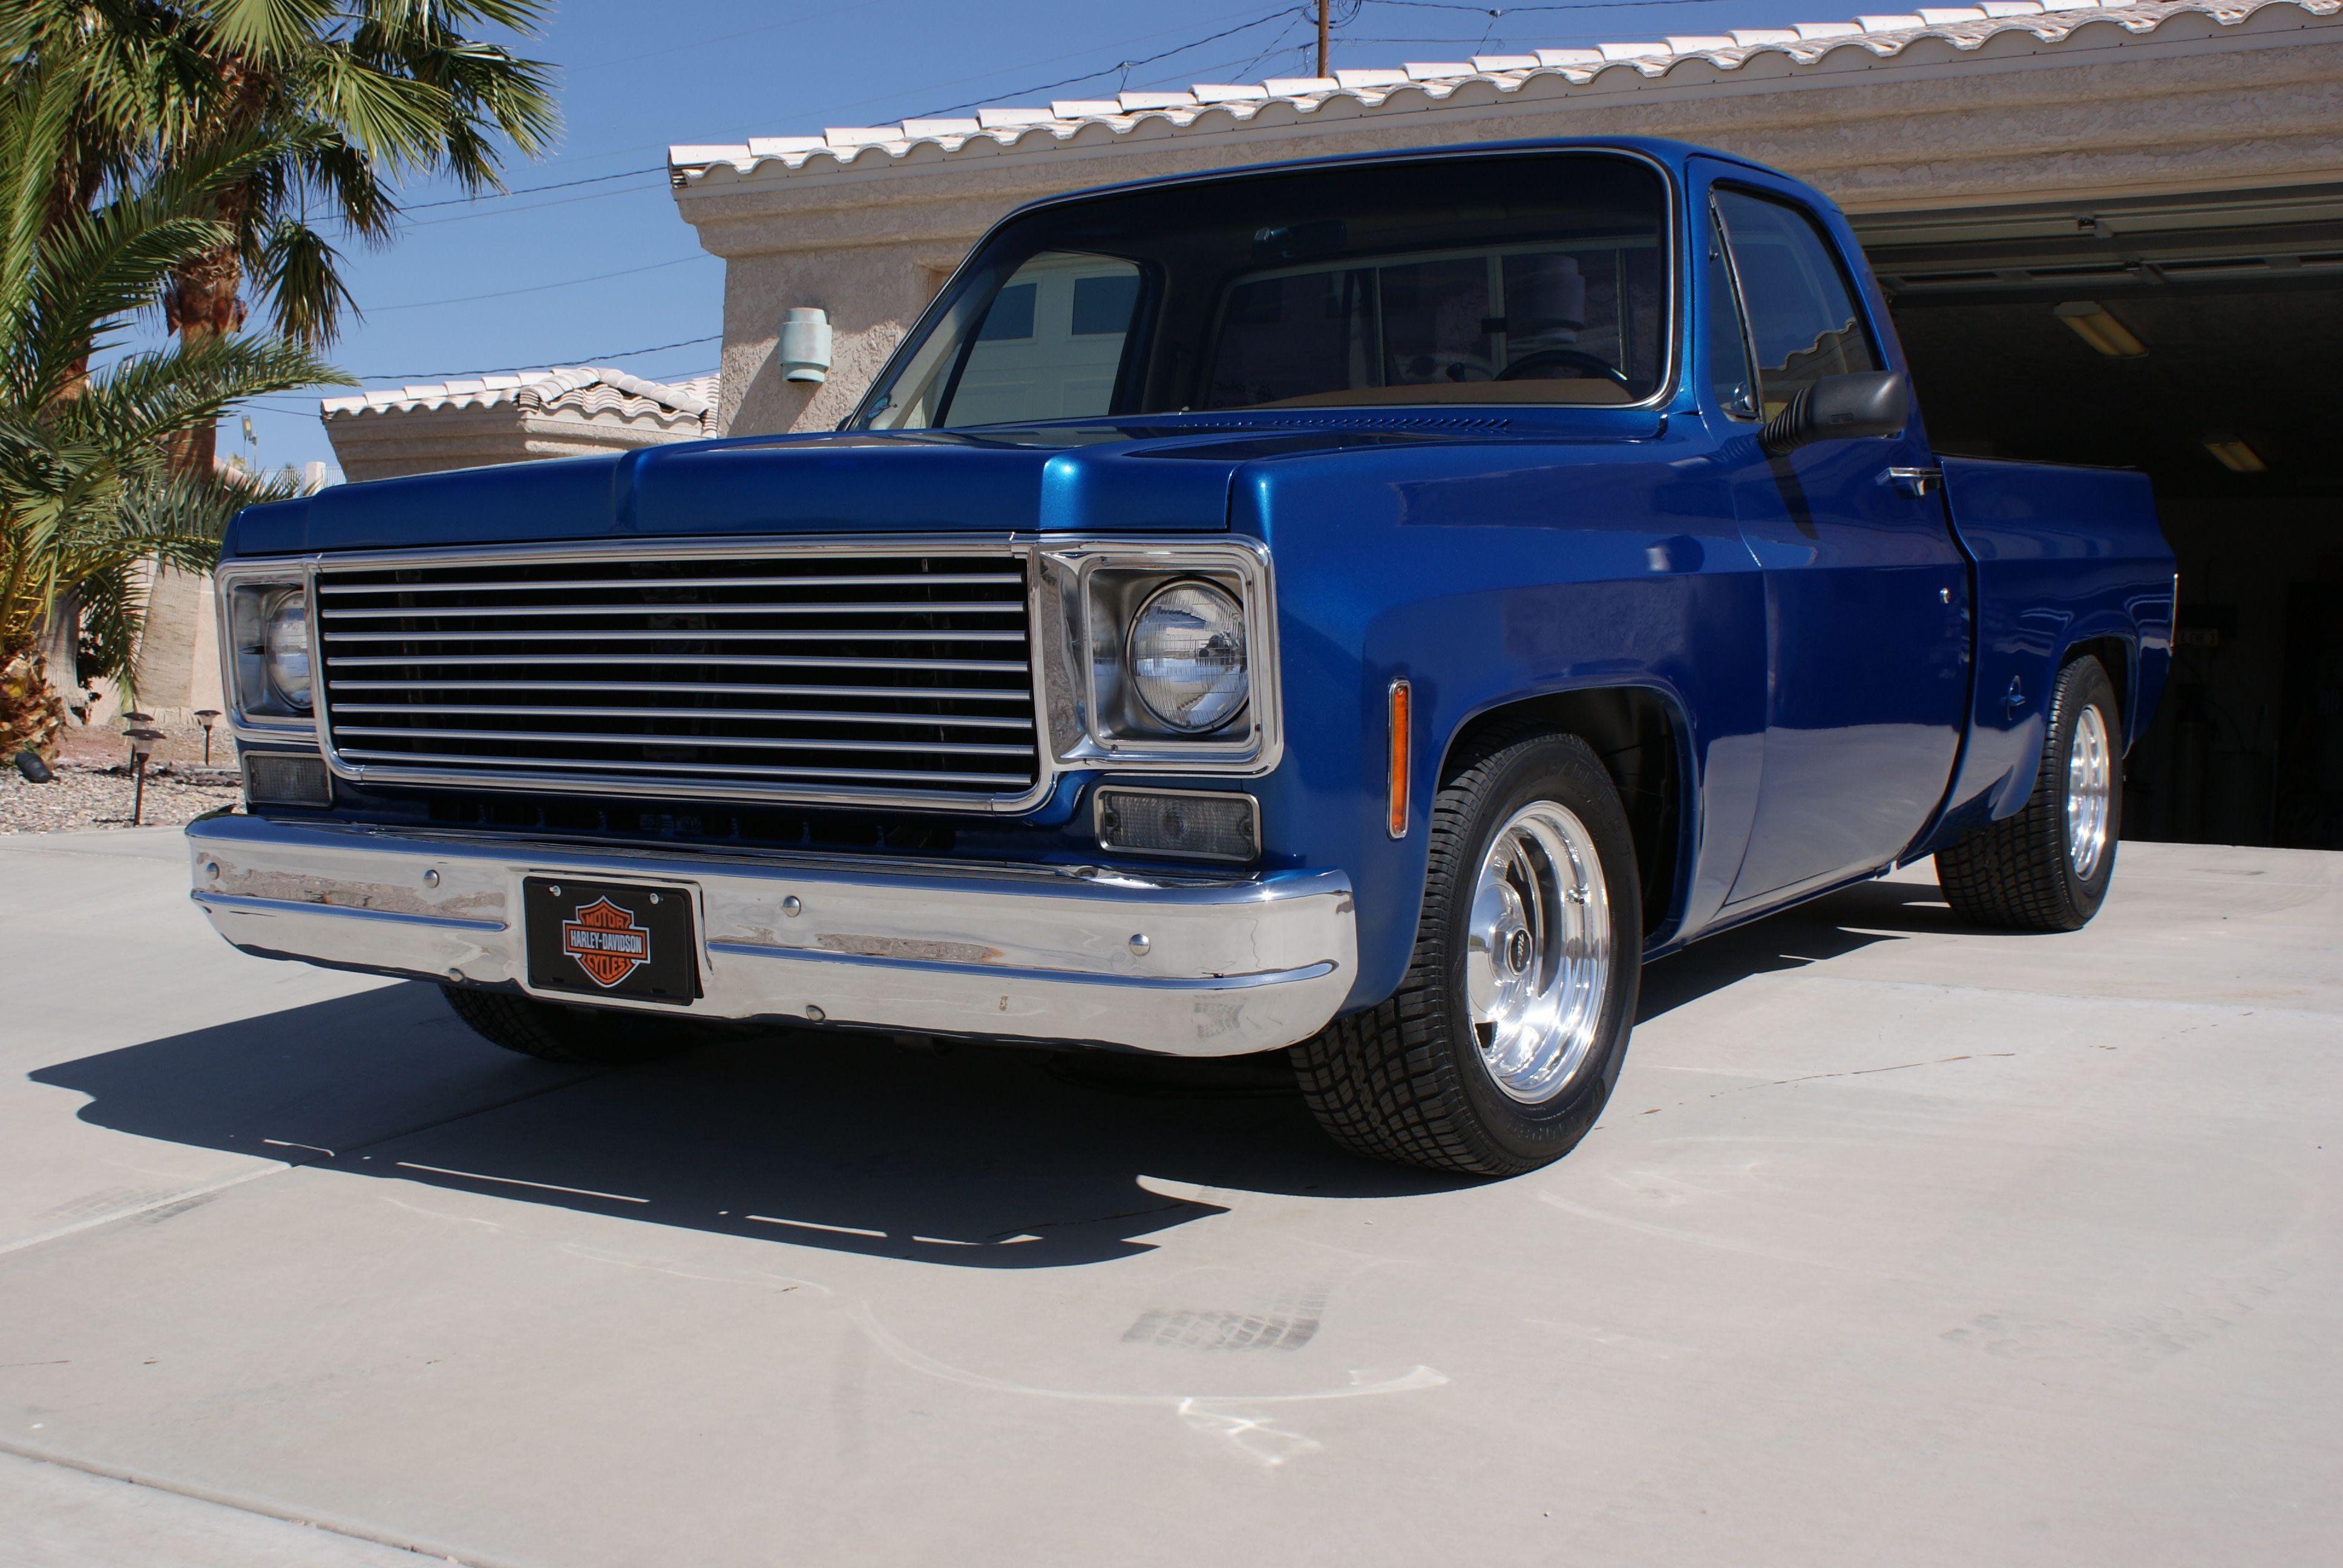 1978 chevy c10 autotrader classics 1978 chevrolet c10 truck blue 8 cylinder  [ 3872 x 2592 Pixel ]